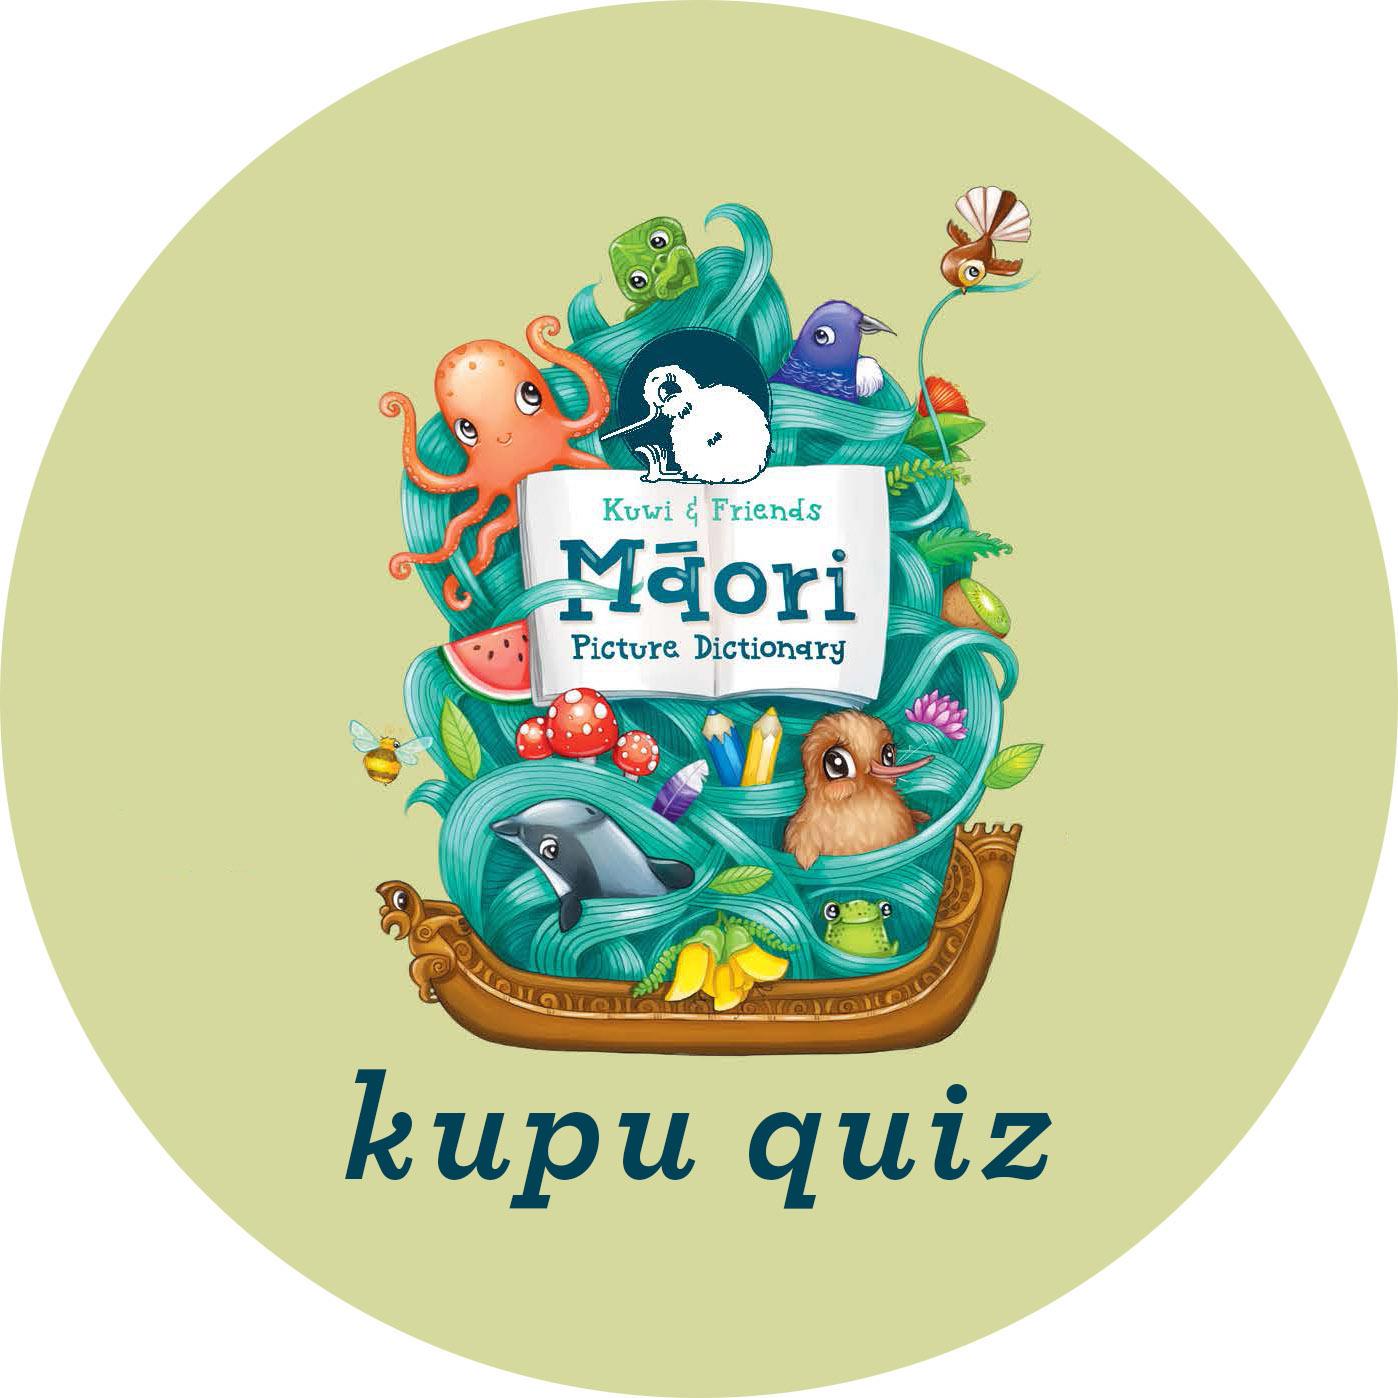 Kuwi Kupu Quiz